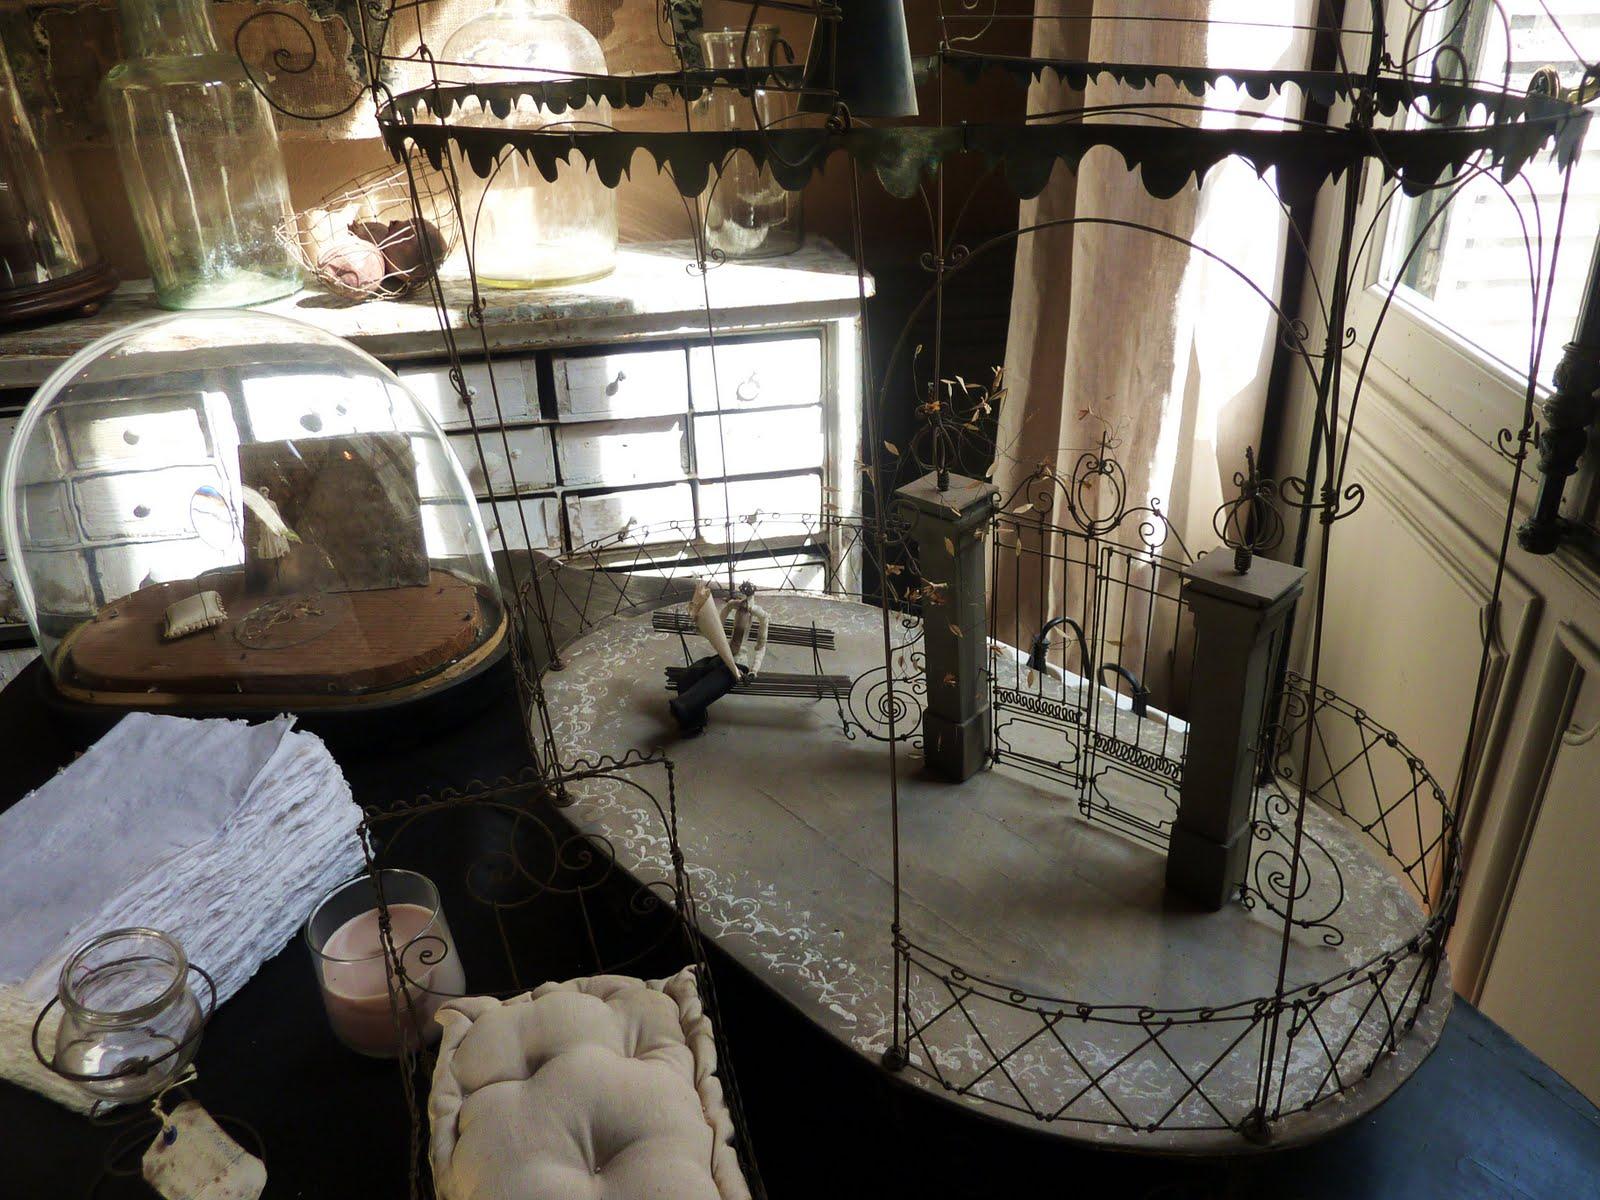 manon 21 vox poluli. Black Bedroom Furniture Sets. Home Design Ideas